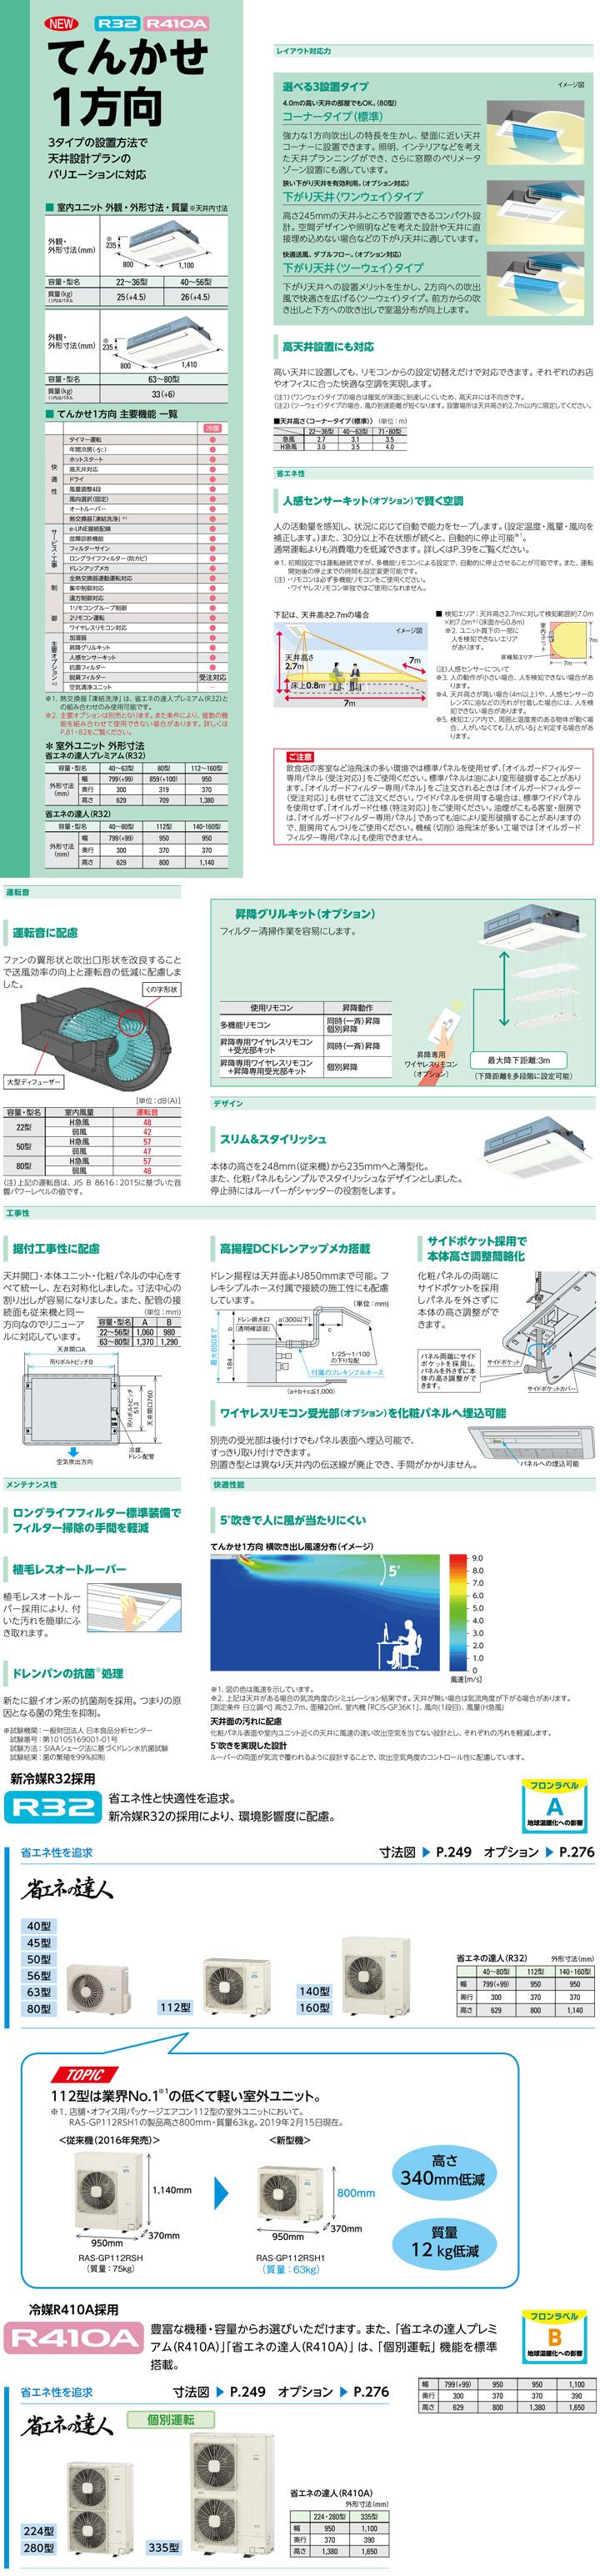 RCIS-GP45RSHJ3カタログ